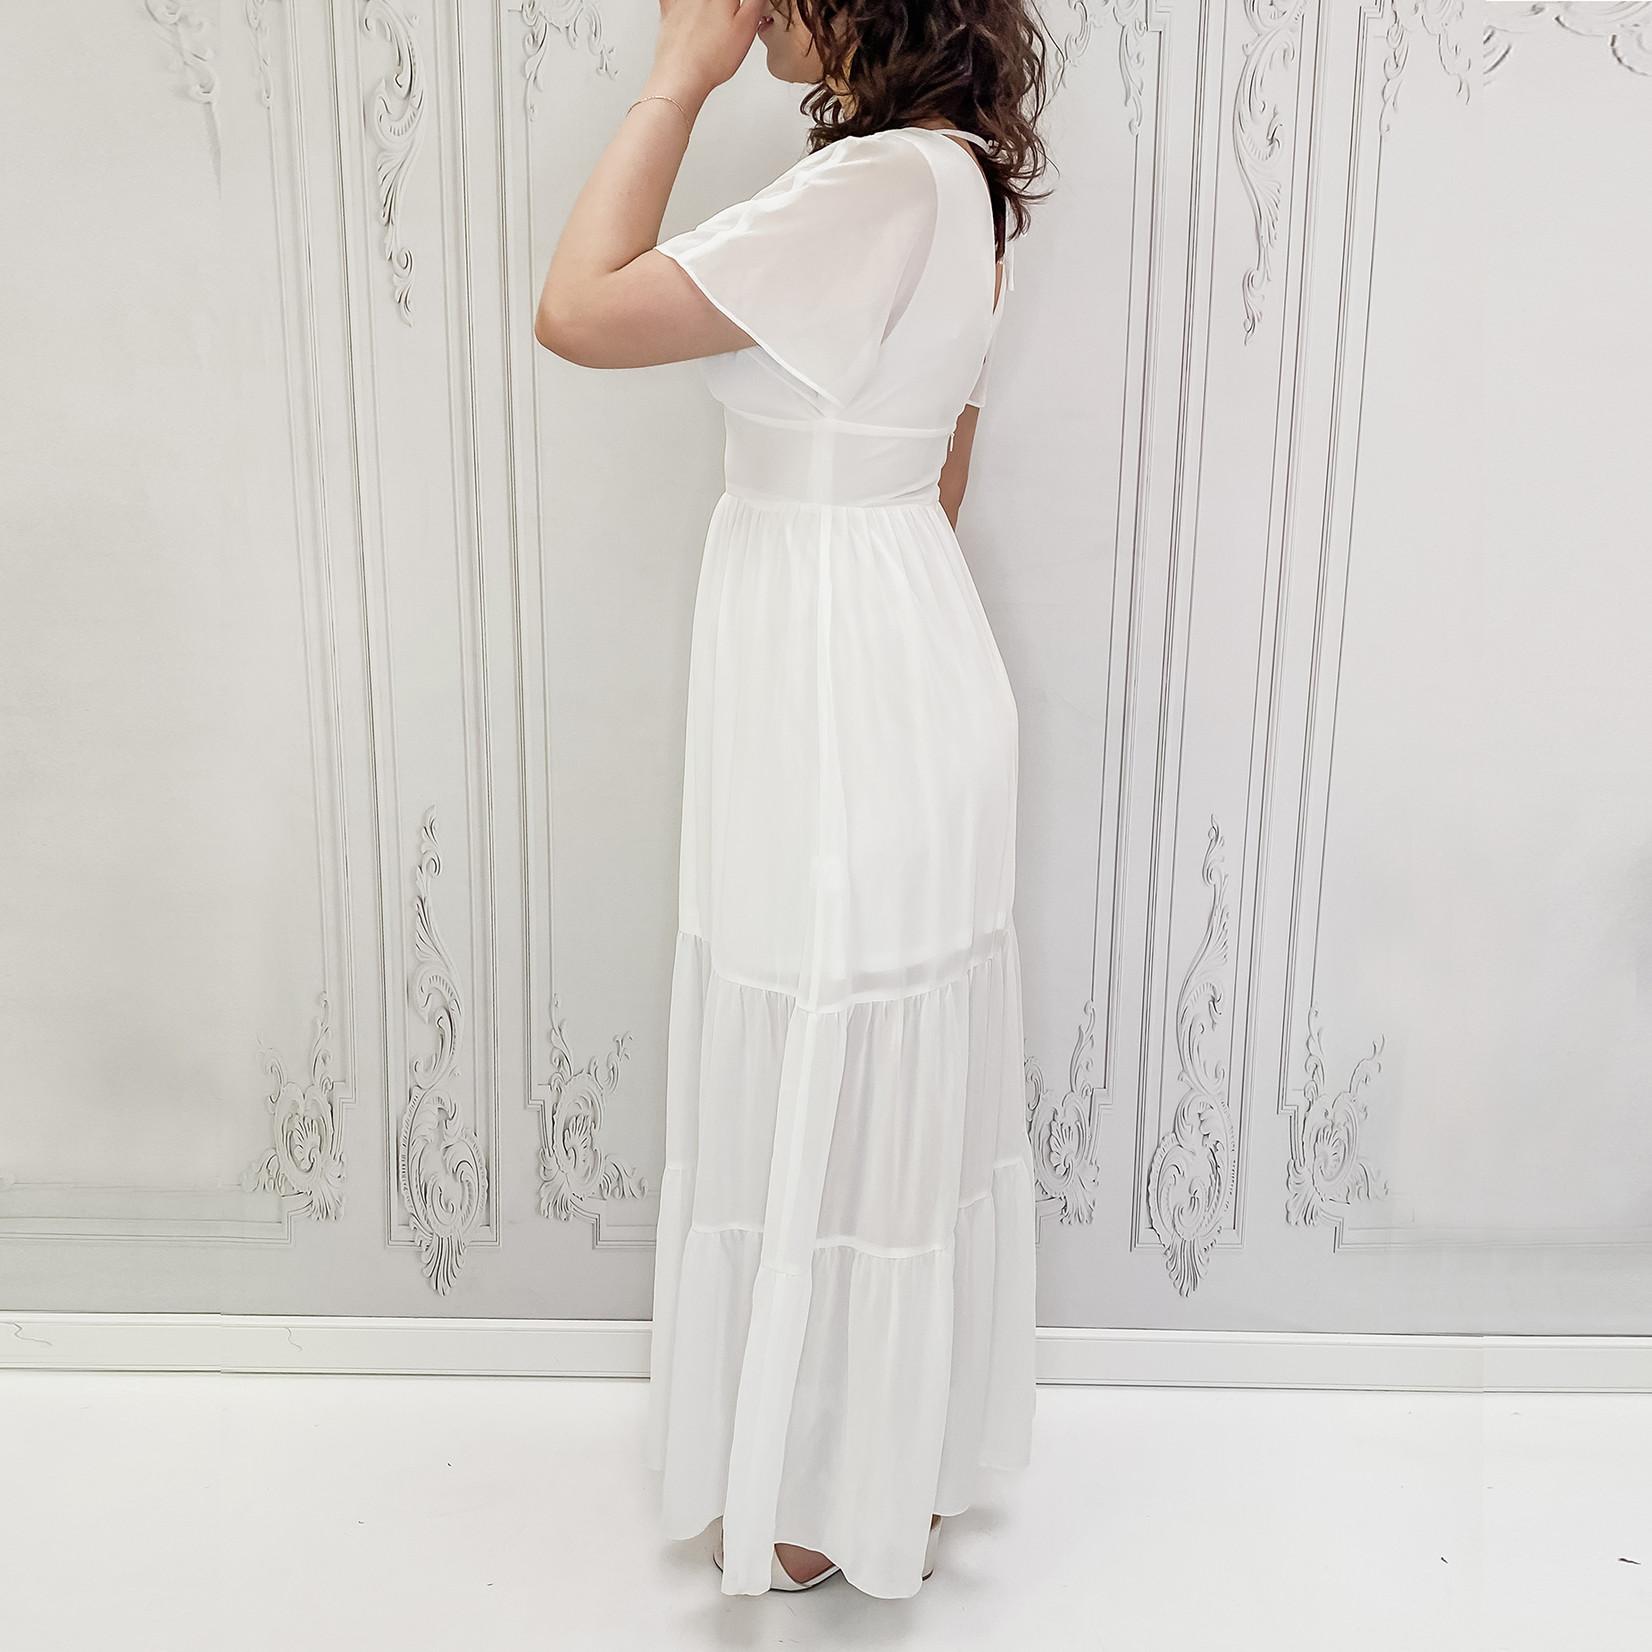 Amalee empire waist maxi dress